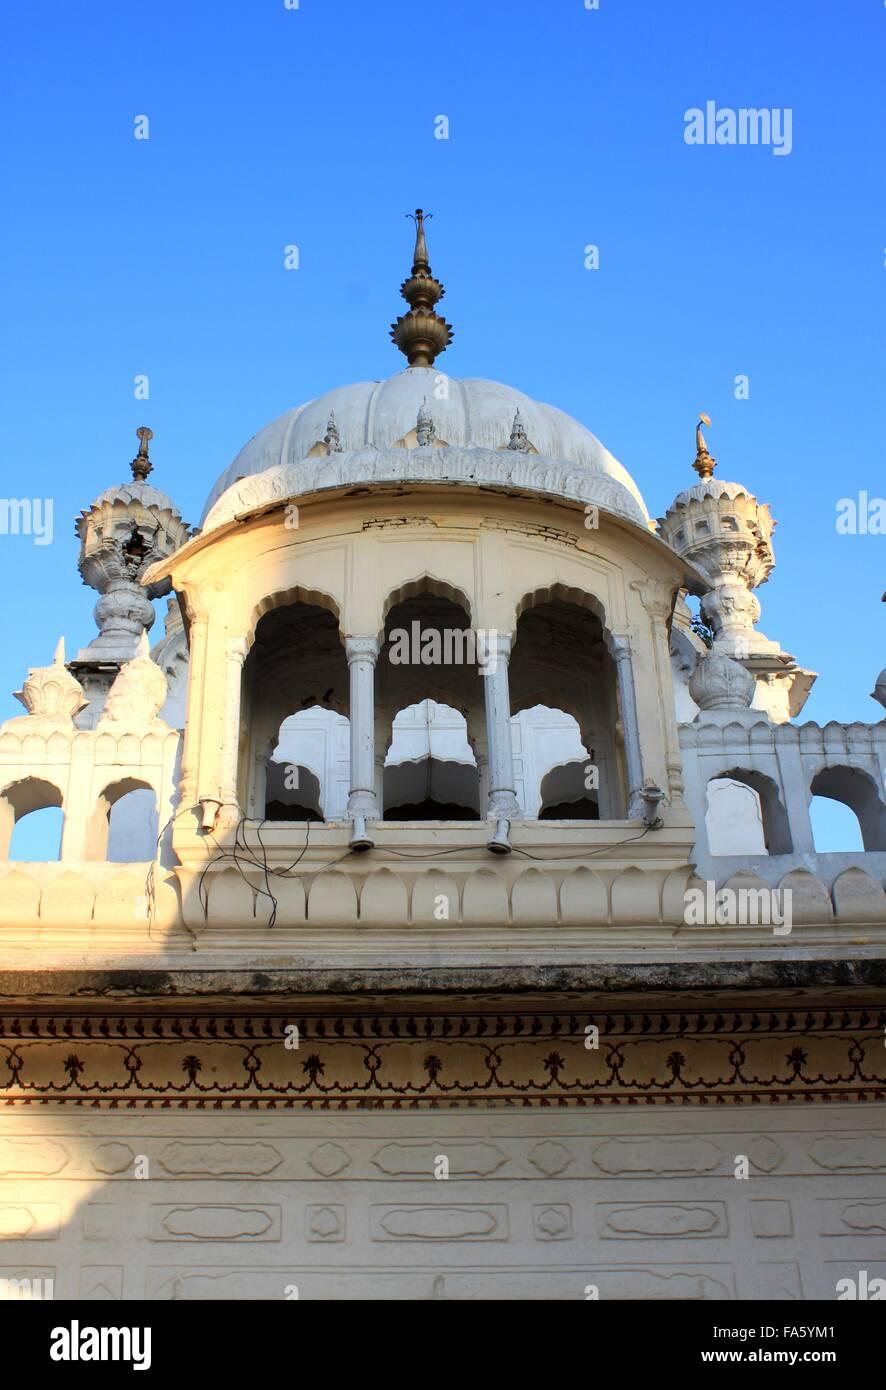 Samadhi Shrine of Ranjit Singh, Lahore, Pakistan - Stock Image